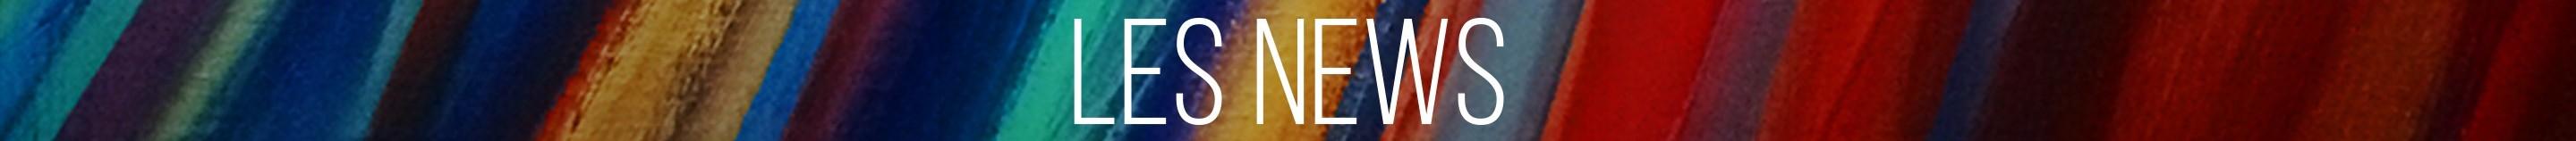 title-lesnews